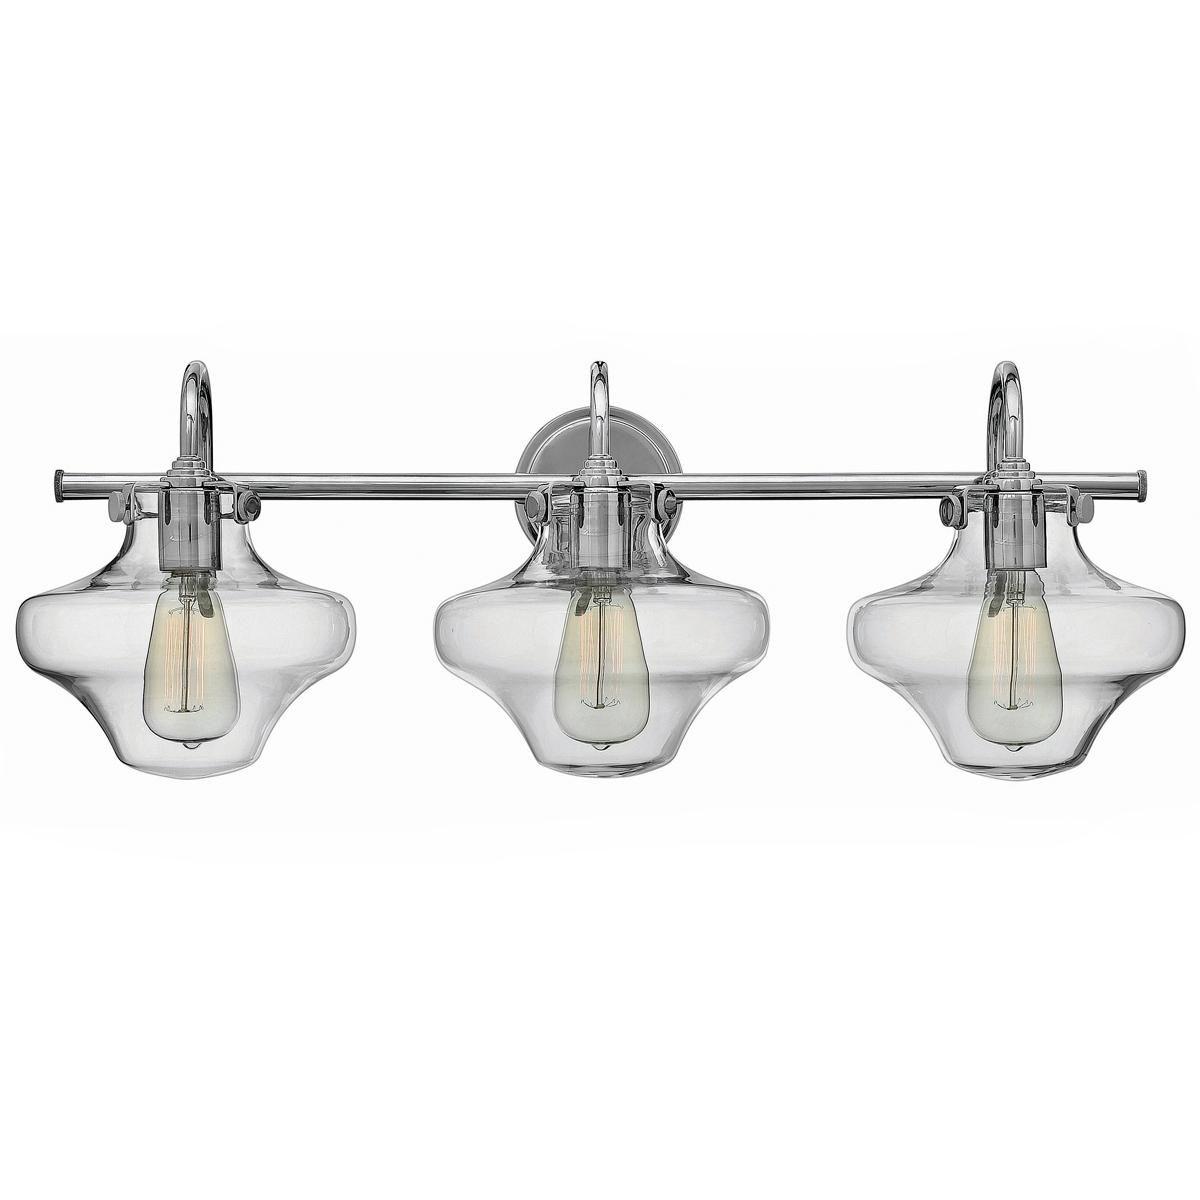 Modern Clear Schoolhouse Globe Vanity - 3 Light - Modern Clear Schoolhouse Globe Vanity - 3 Light Nickel Finish